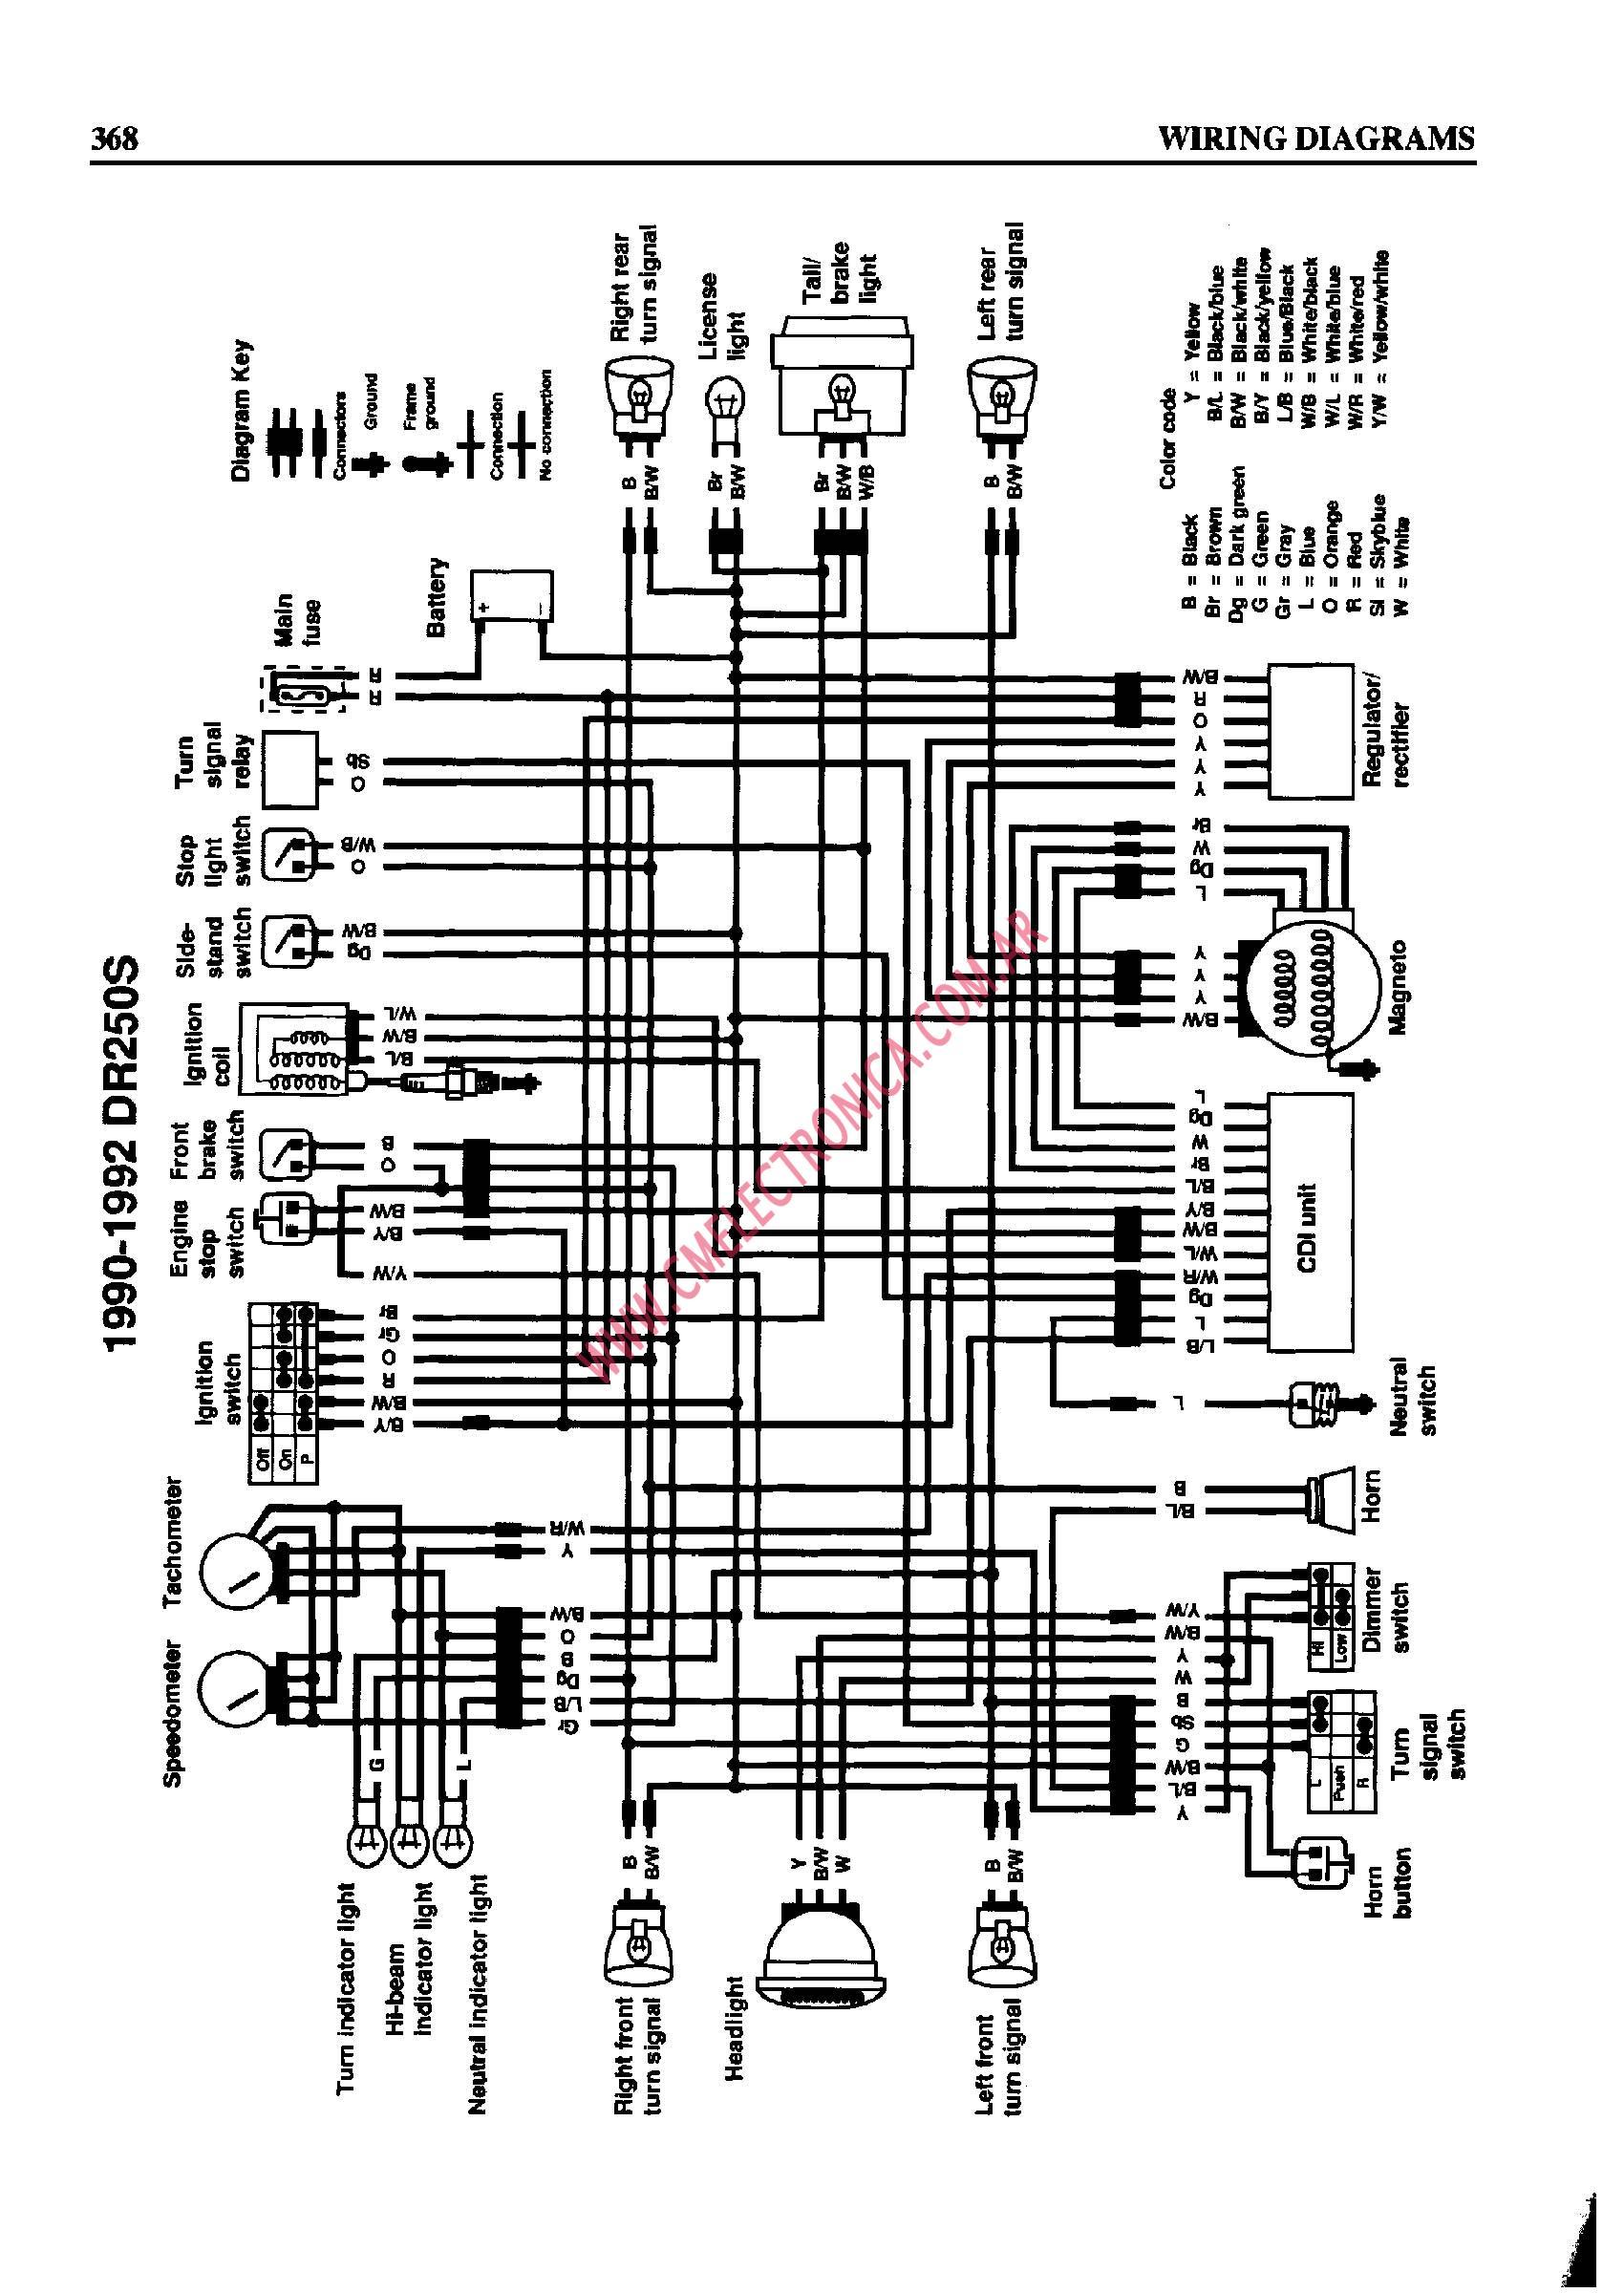 mercedes sl600 wiring diagram mercedes timing marks wiring